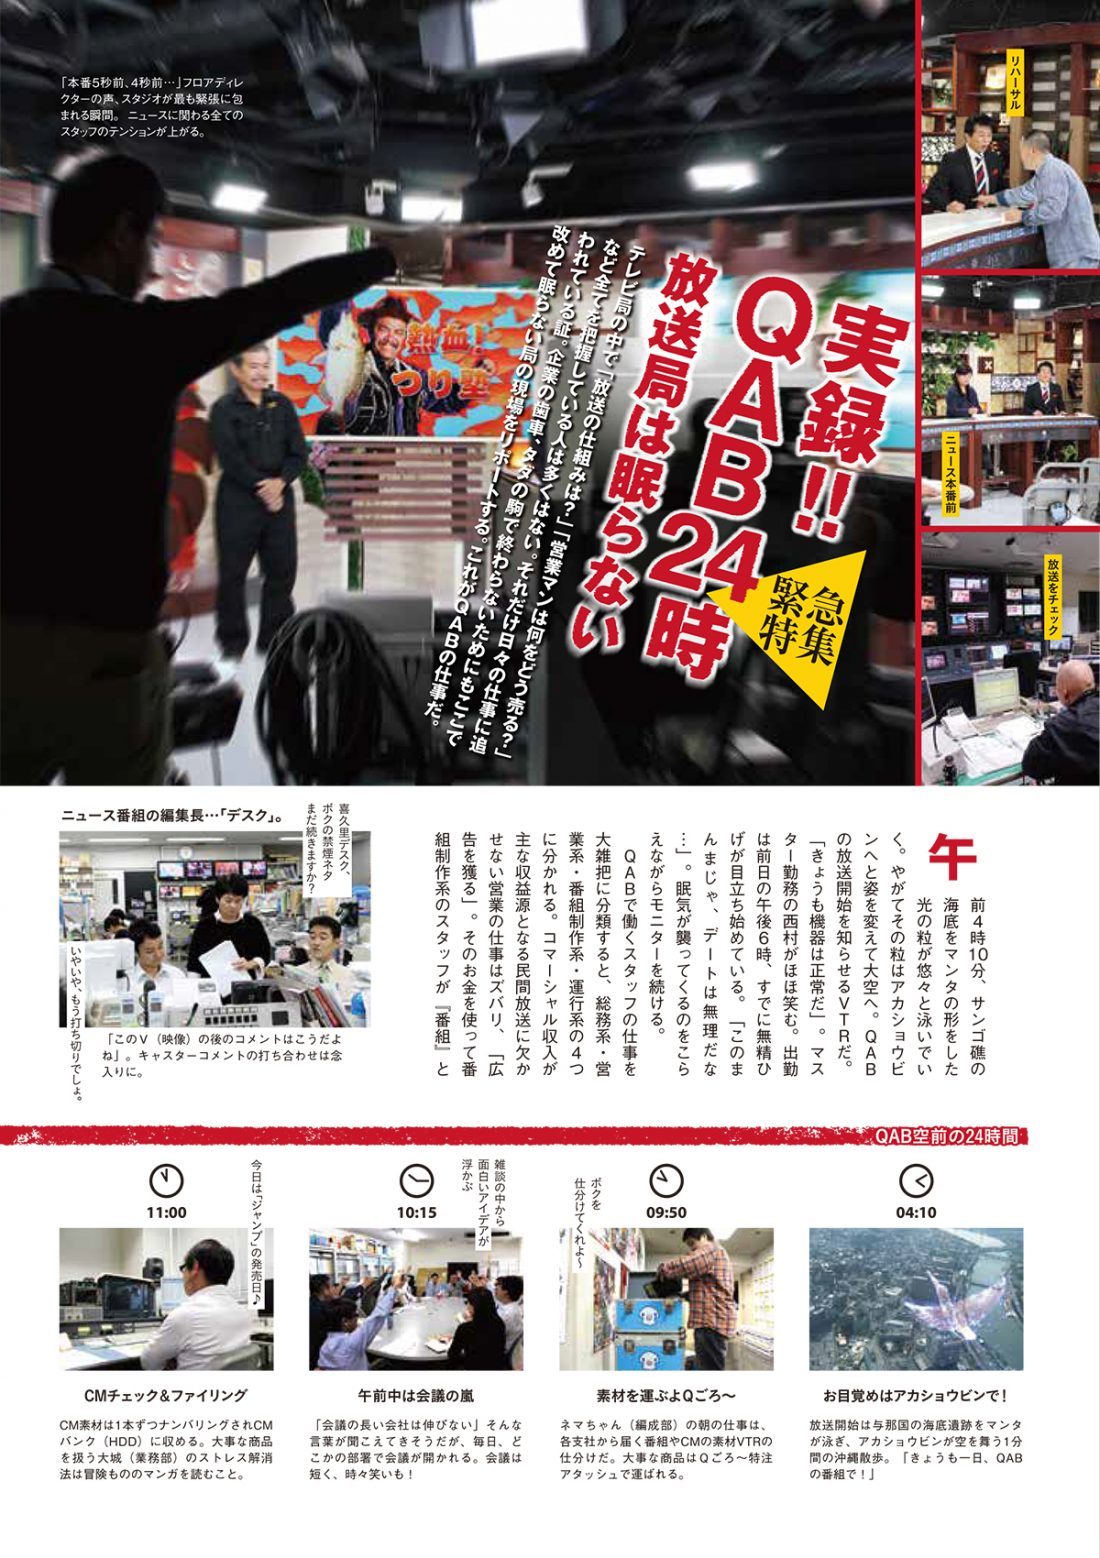 https://www.qab.co.jp/qgoro/wp-content/uploads/quun_0102-1100x1558.jpg